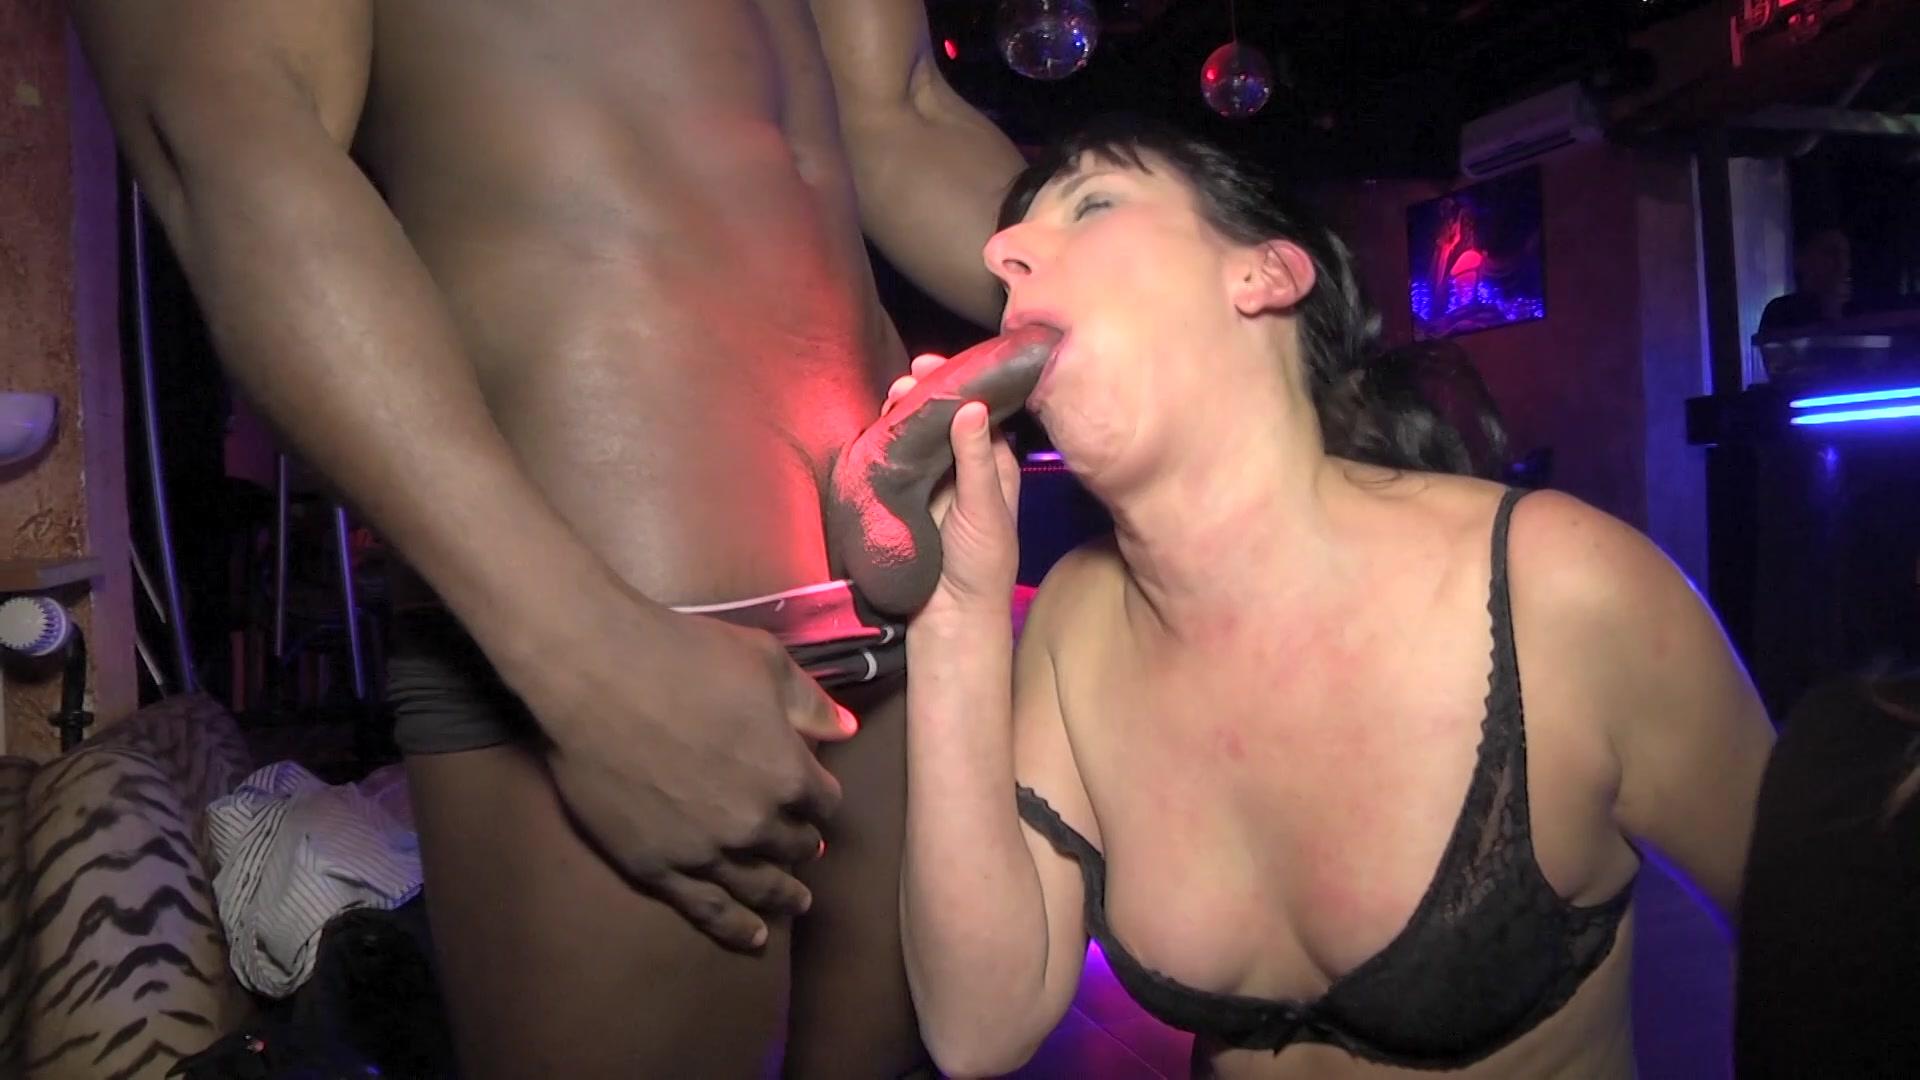 Hardcore latina porn